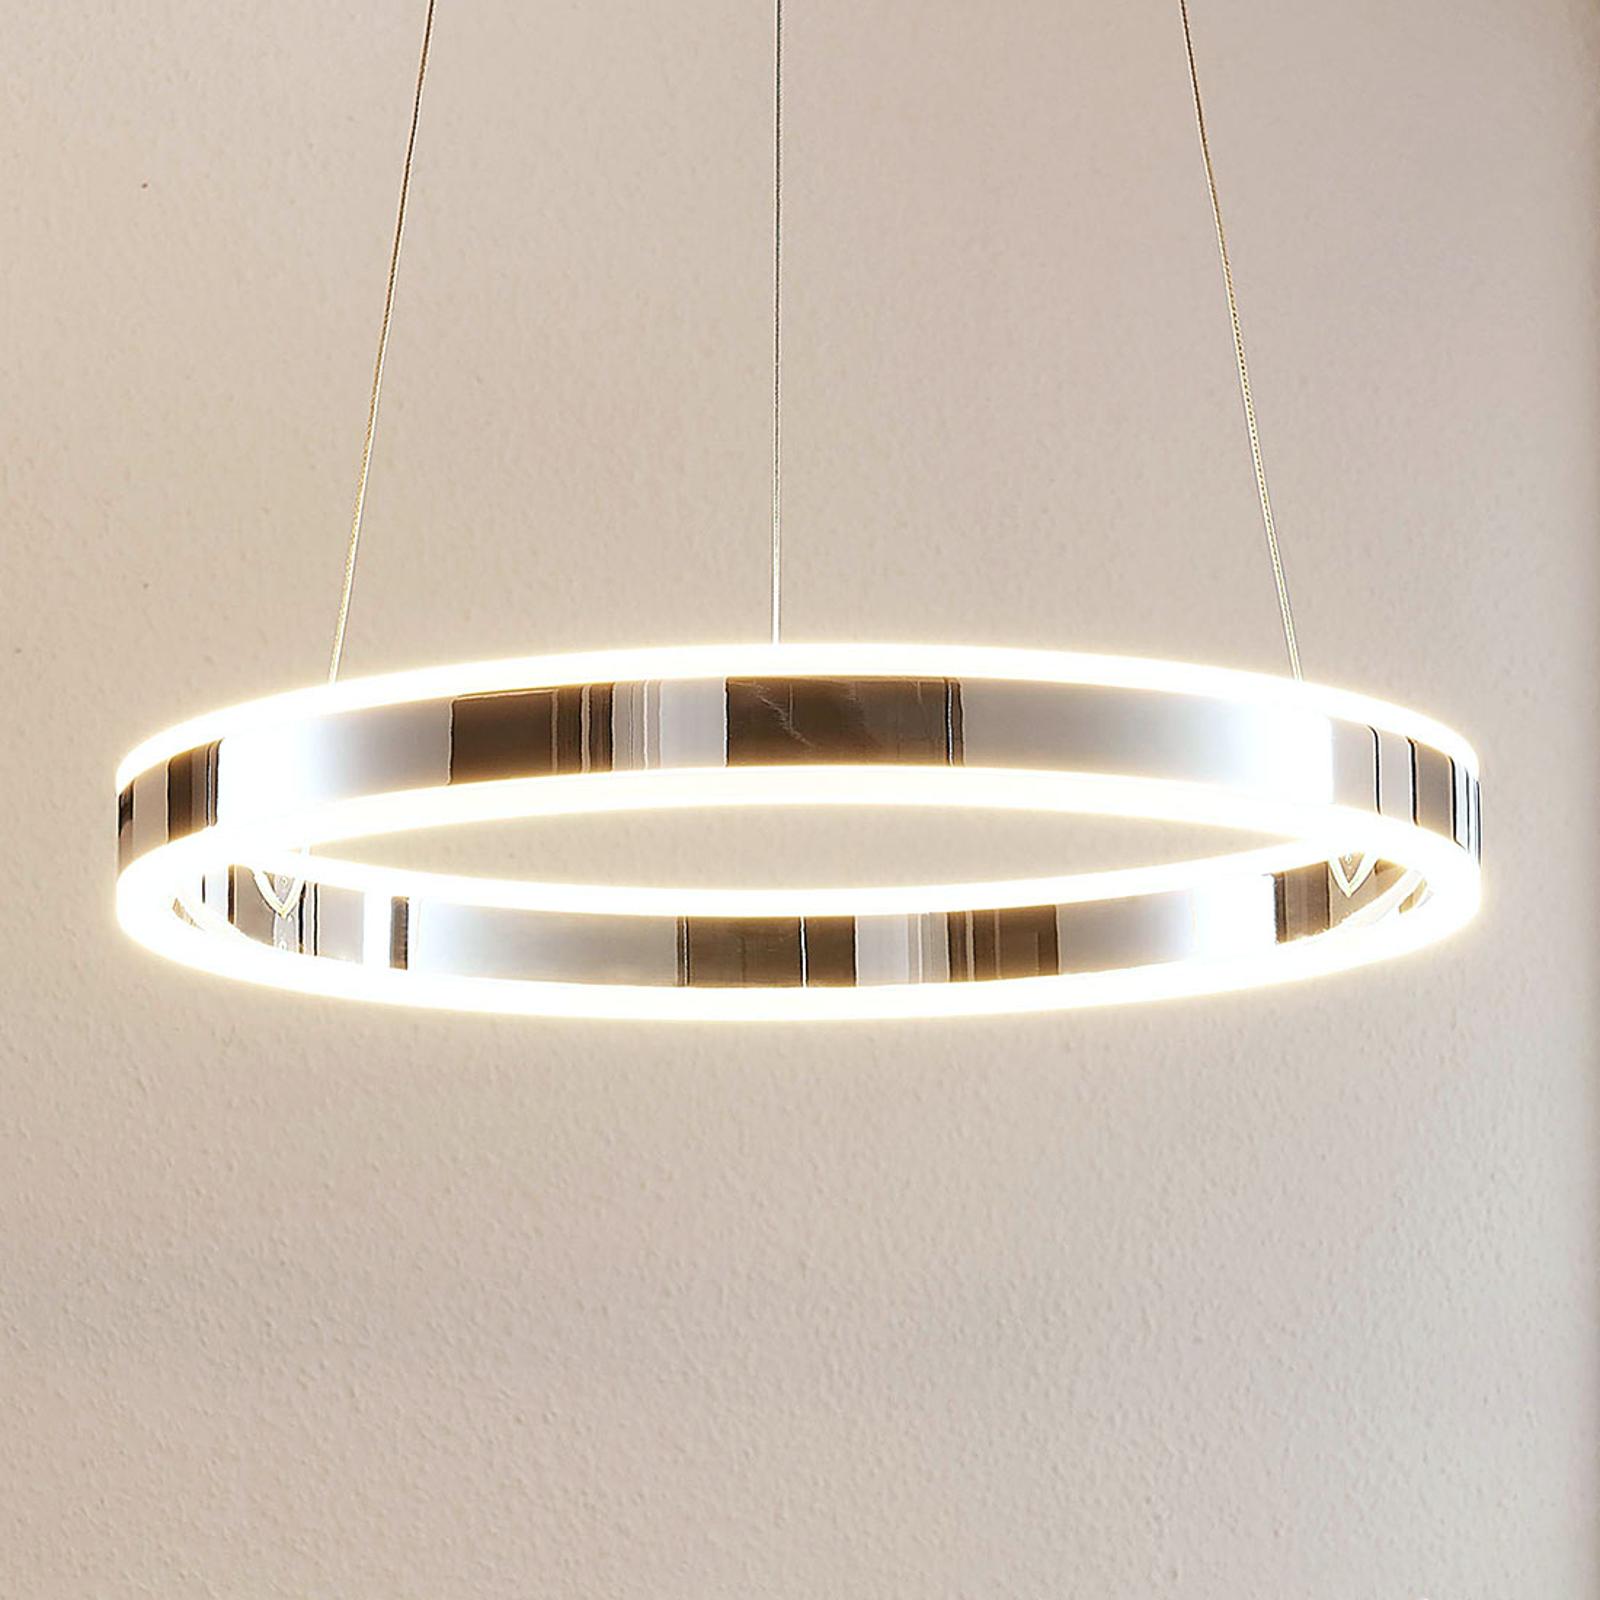 Lámpara colgante LED Lyani cromo atenuable, 50 cm